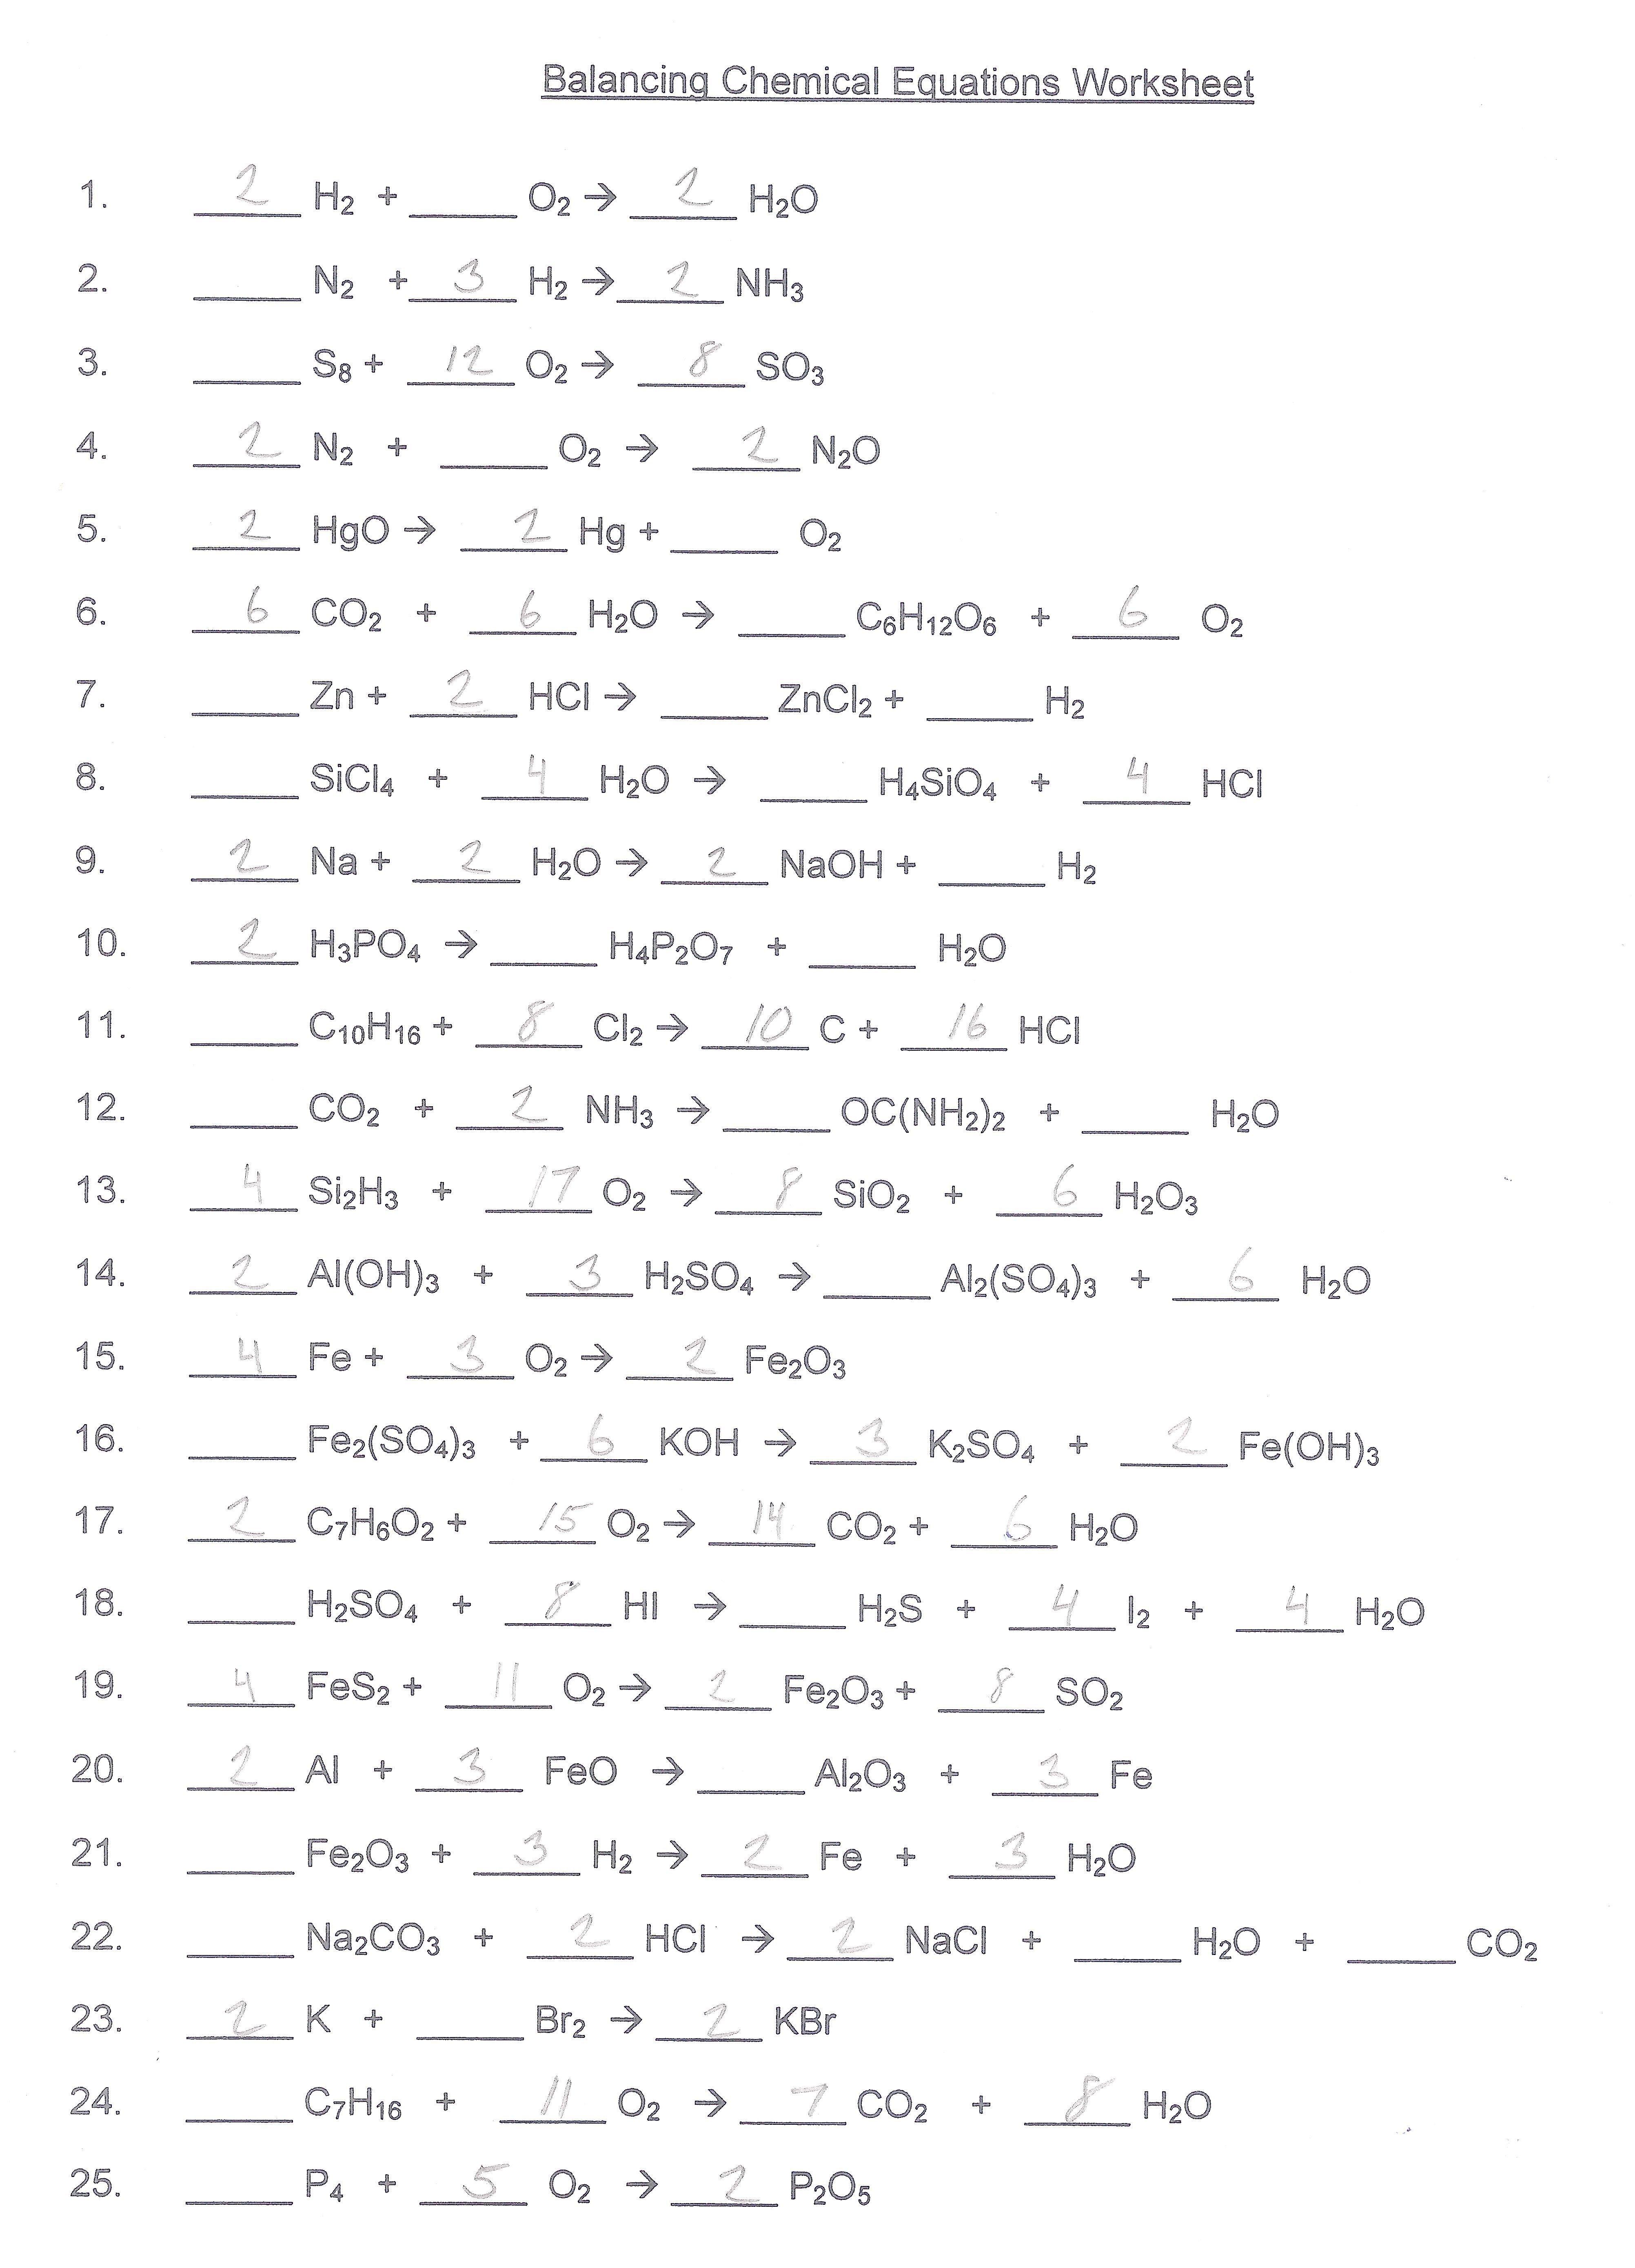 Chemistry Worksheets Answer Key The Best Worksheets Image